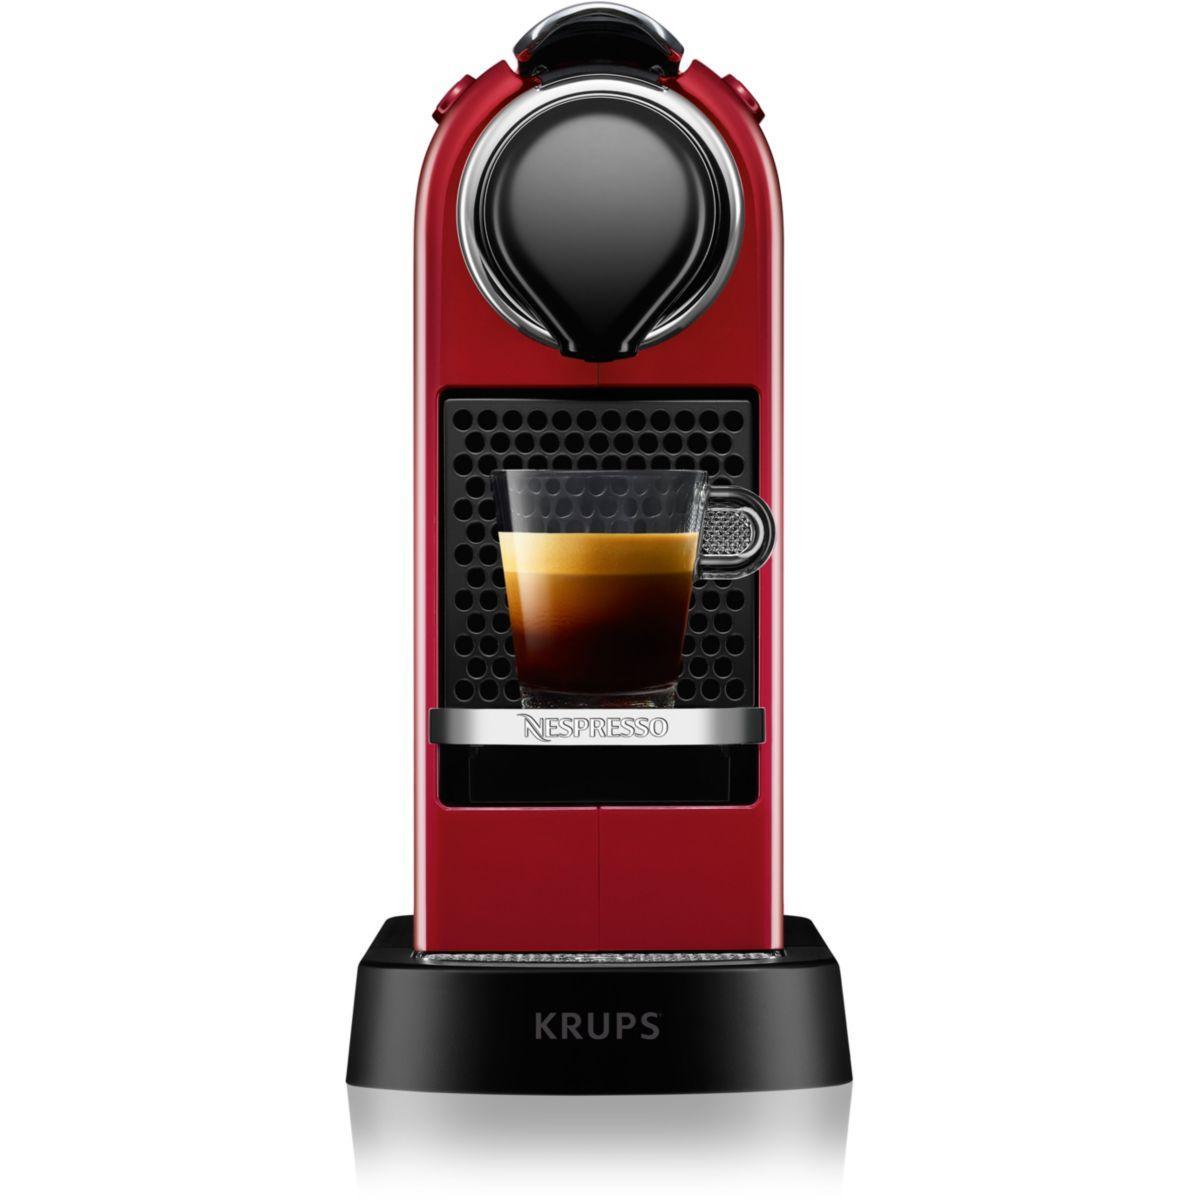 Nespresso krups yy2731fd citiz rouge - livraison offerte : code liv